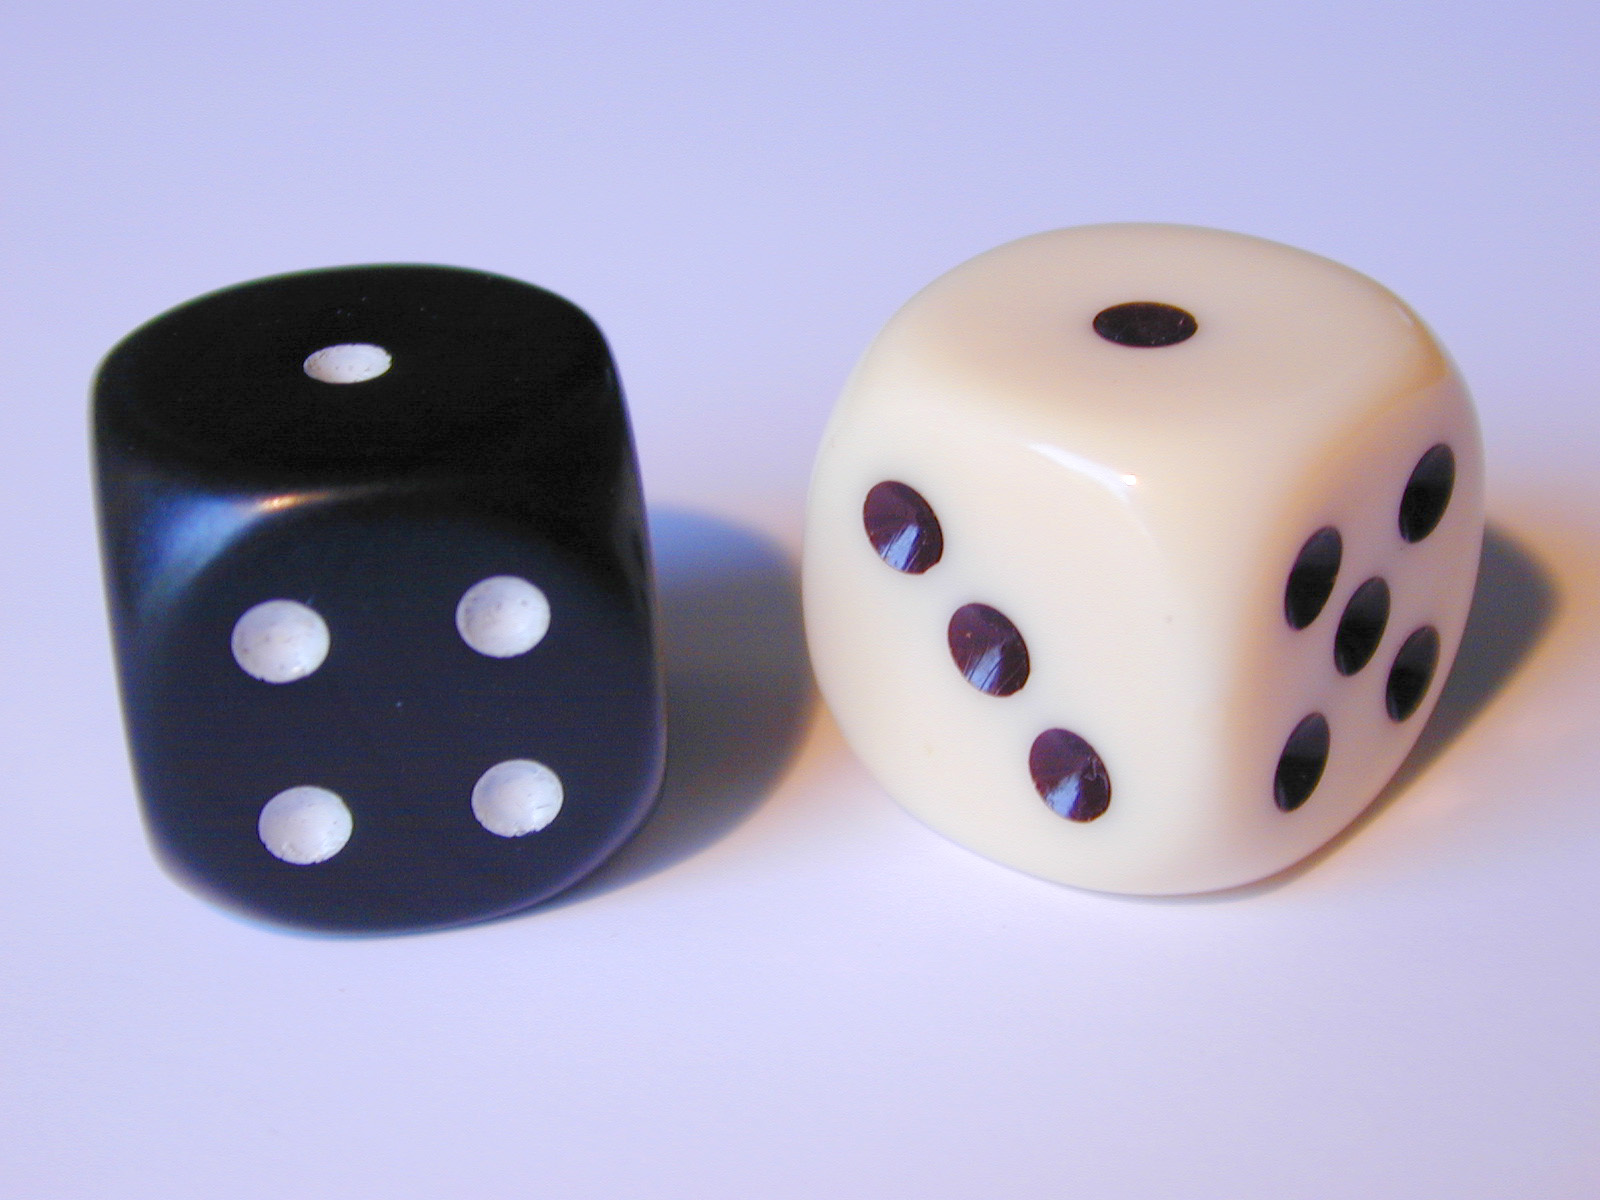 2 Dice, Bet, Black, Casino, Chance, HQ Photo